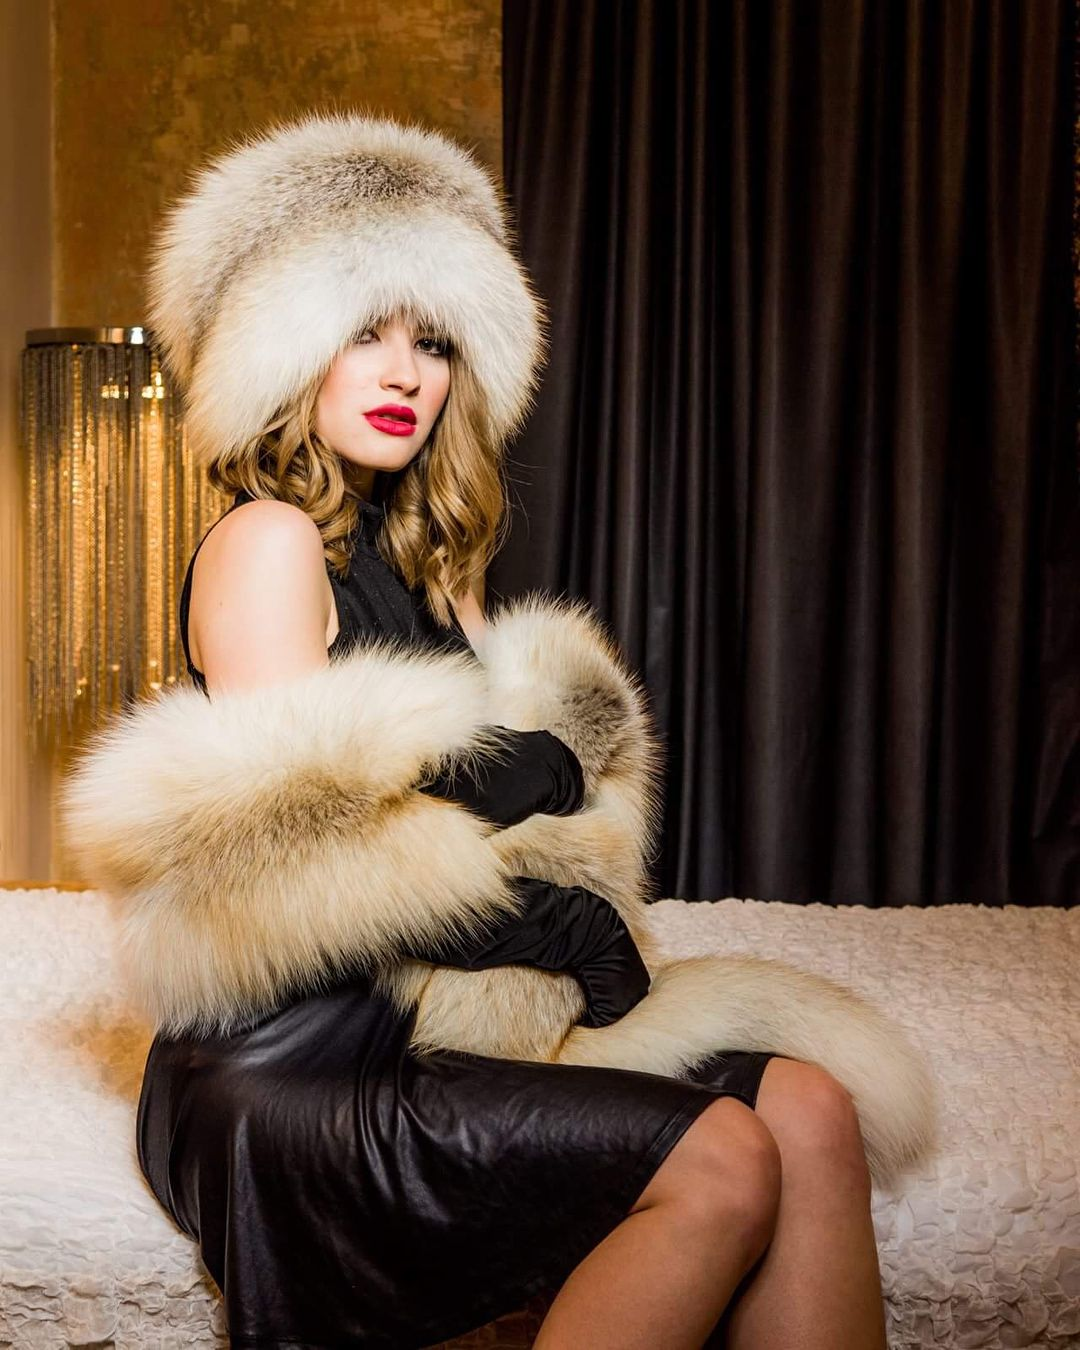 Seductive girl in fur, big boobs realiry sex